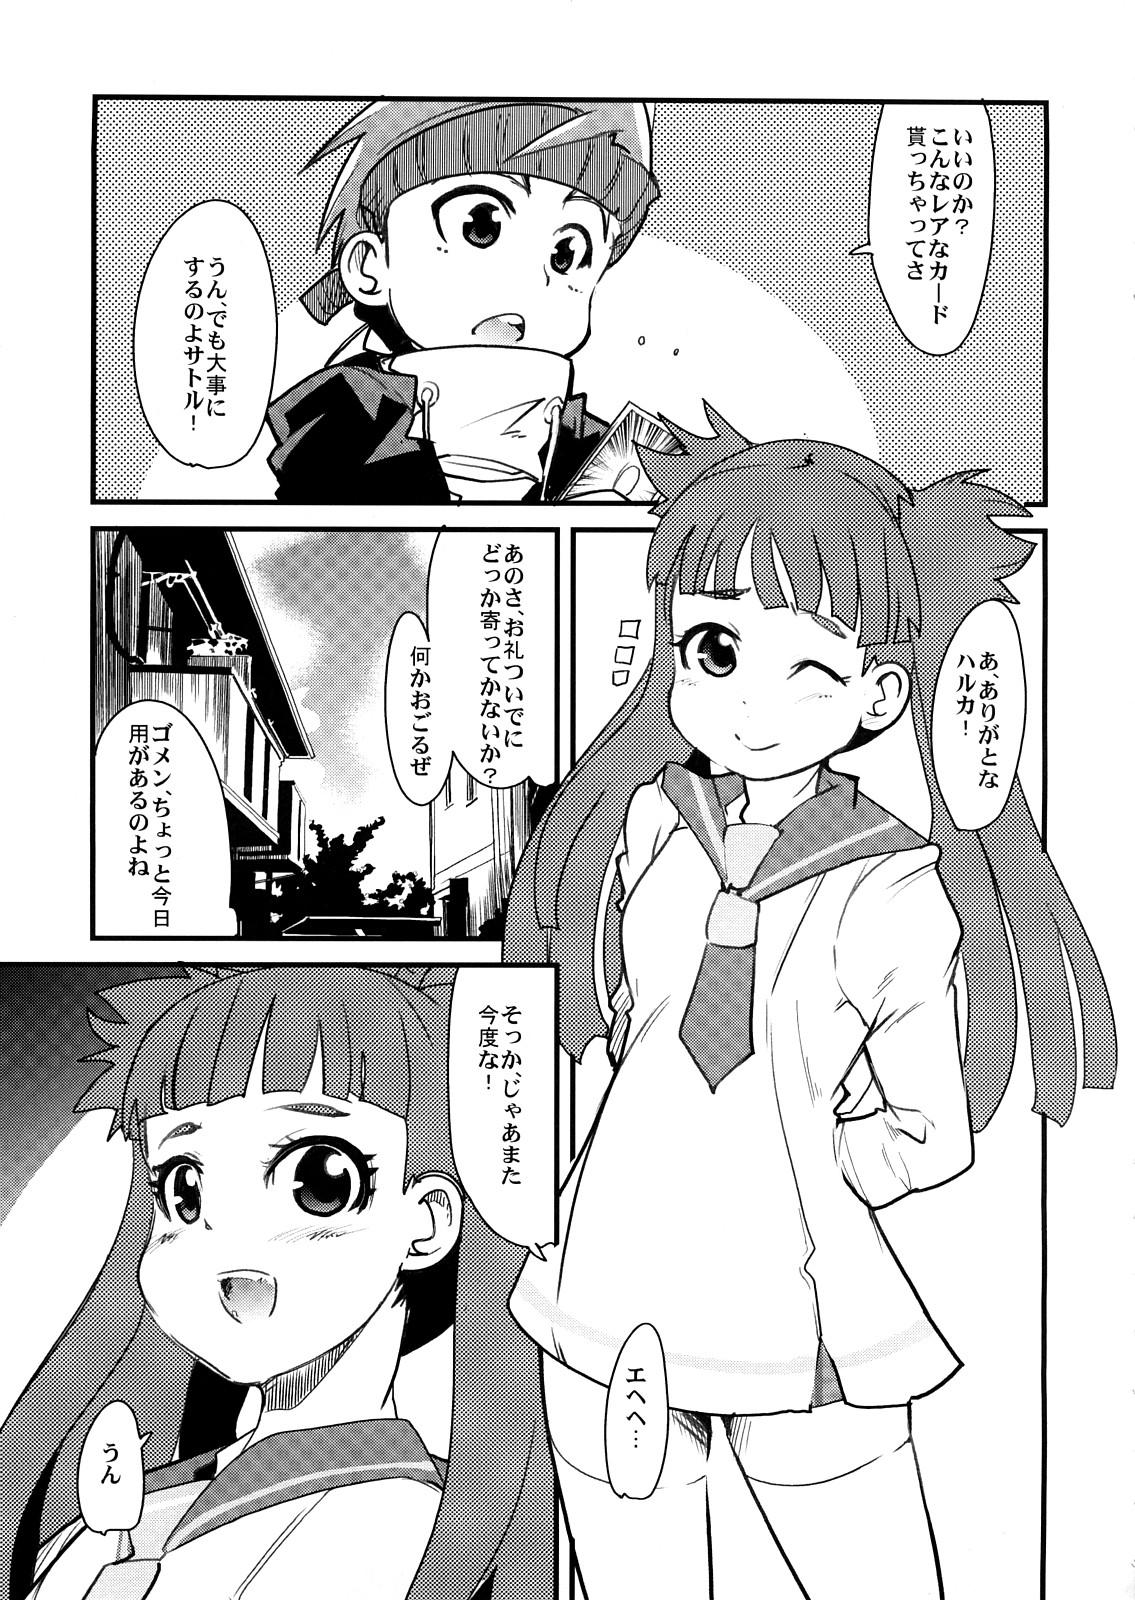 DS tte Omoshiroi Game ga Ookute Suteki 3